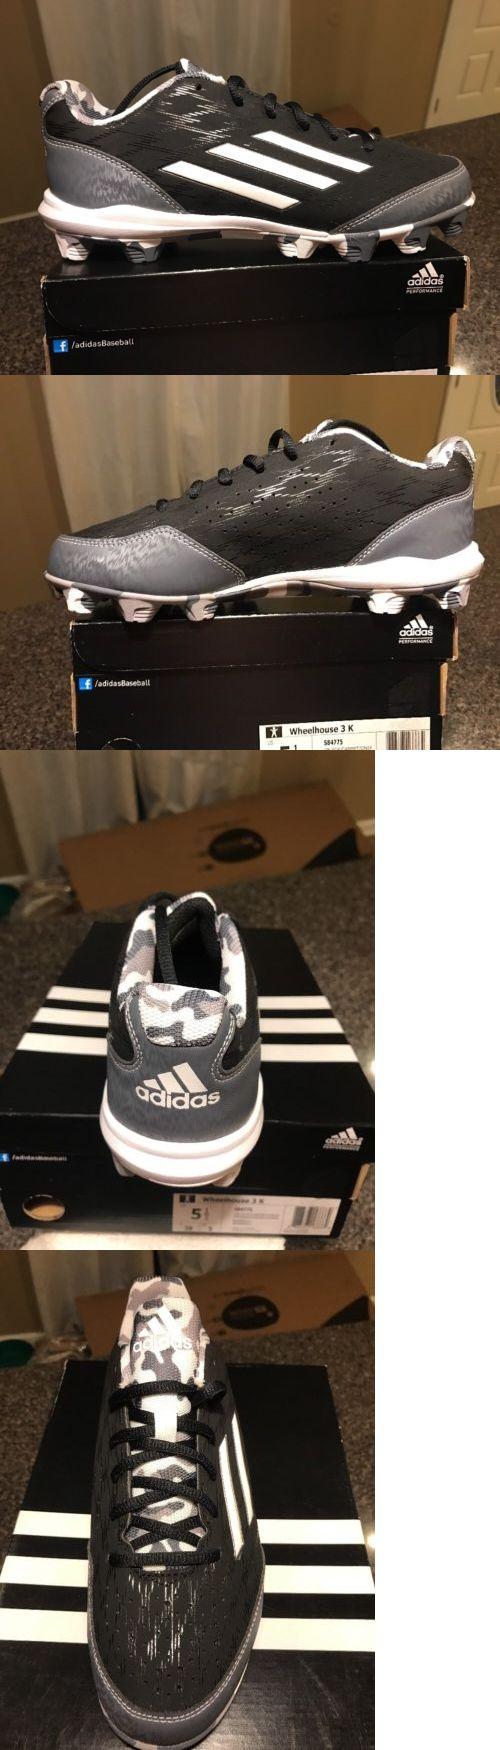 Youth 159061: New Adidas Wheelhouse 3 K Mid Youth Cleats Sz 5.5 -> BUY IT NOW ONLY: $35.99 on eBay!